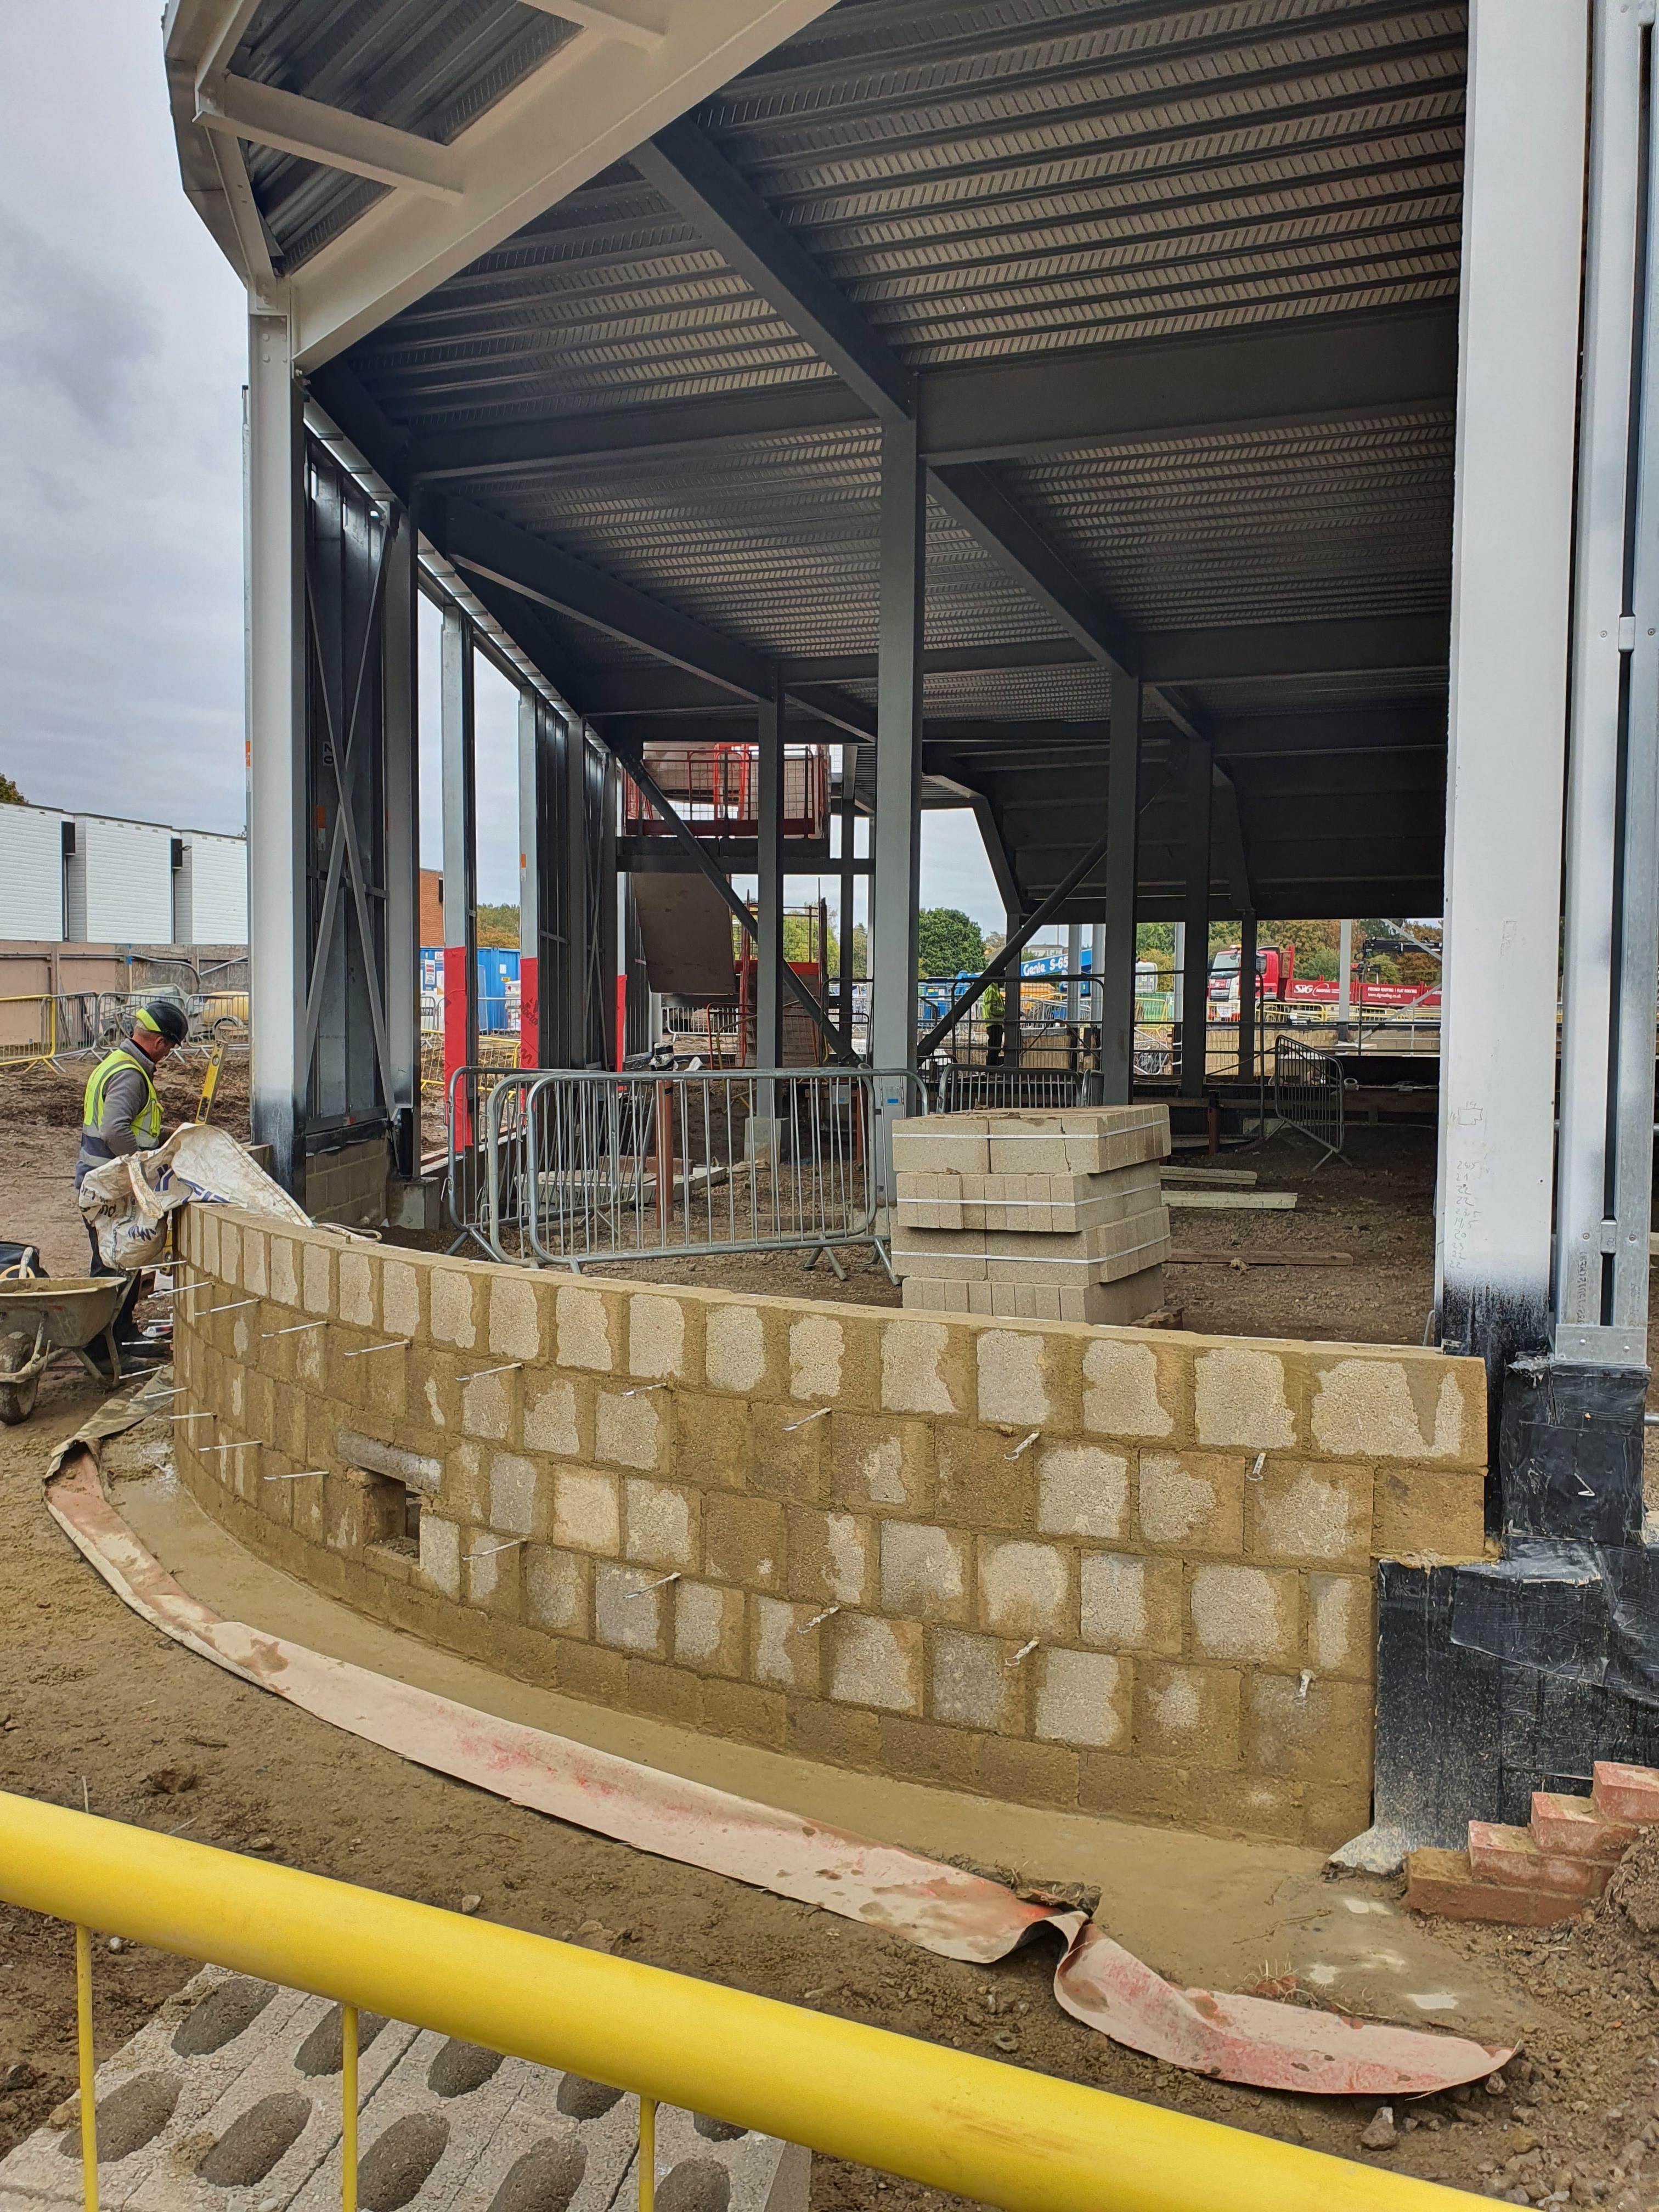 Curved brick work